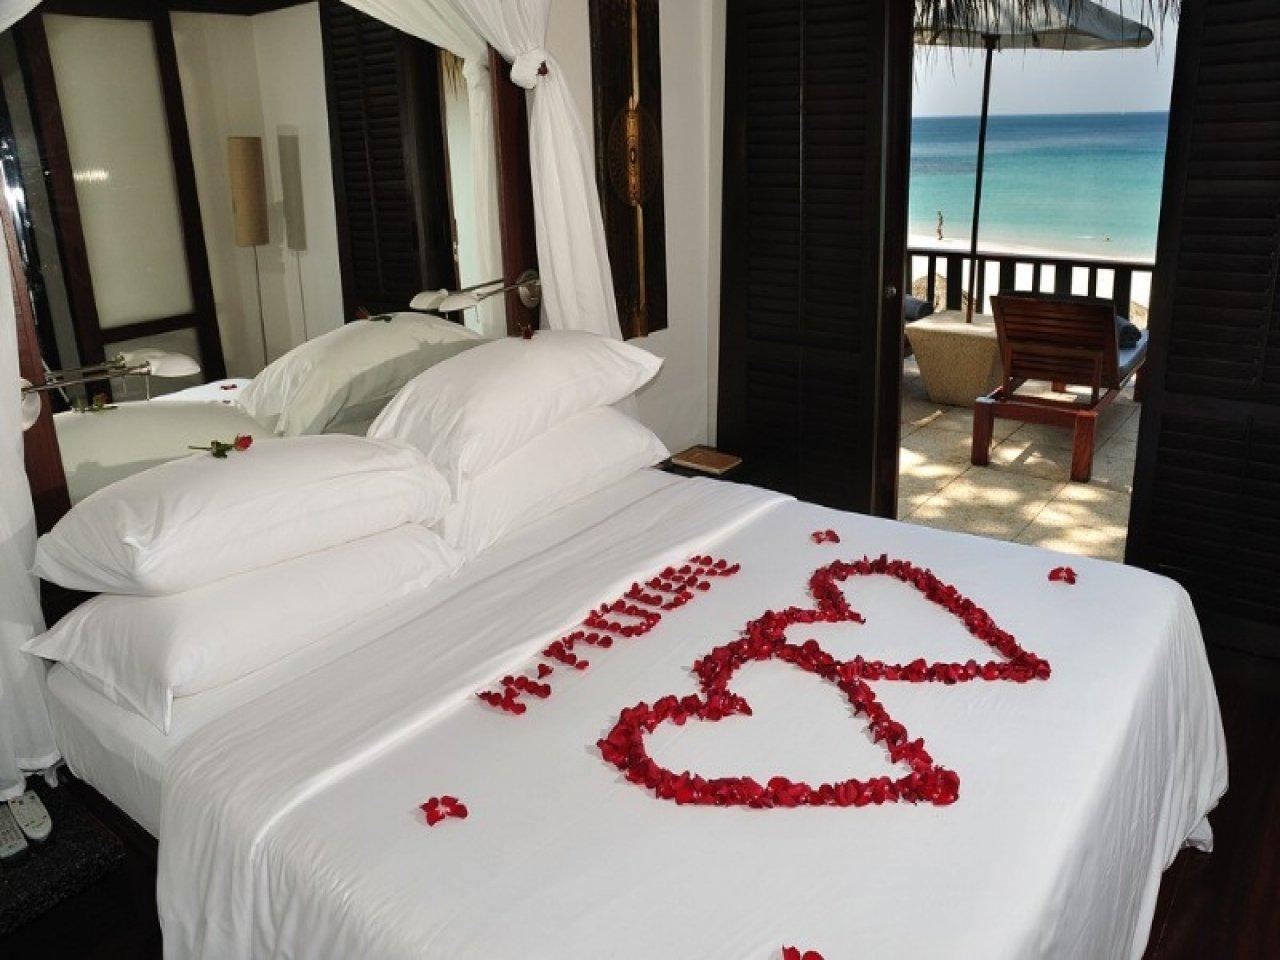 10 Trendy Romantic Ideas For Hotel Room decor decorate hotel room romantic popular home design creative 2020